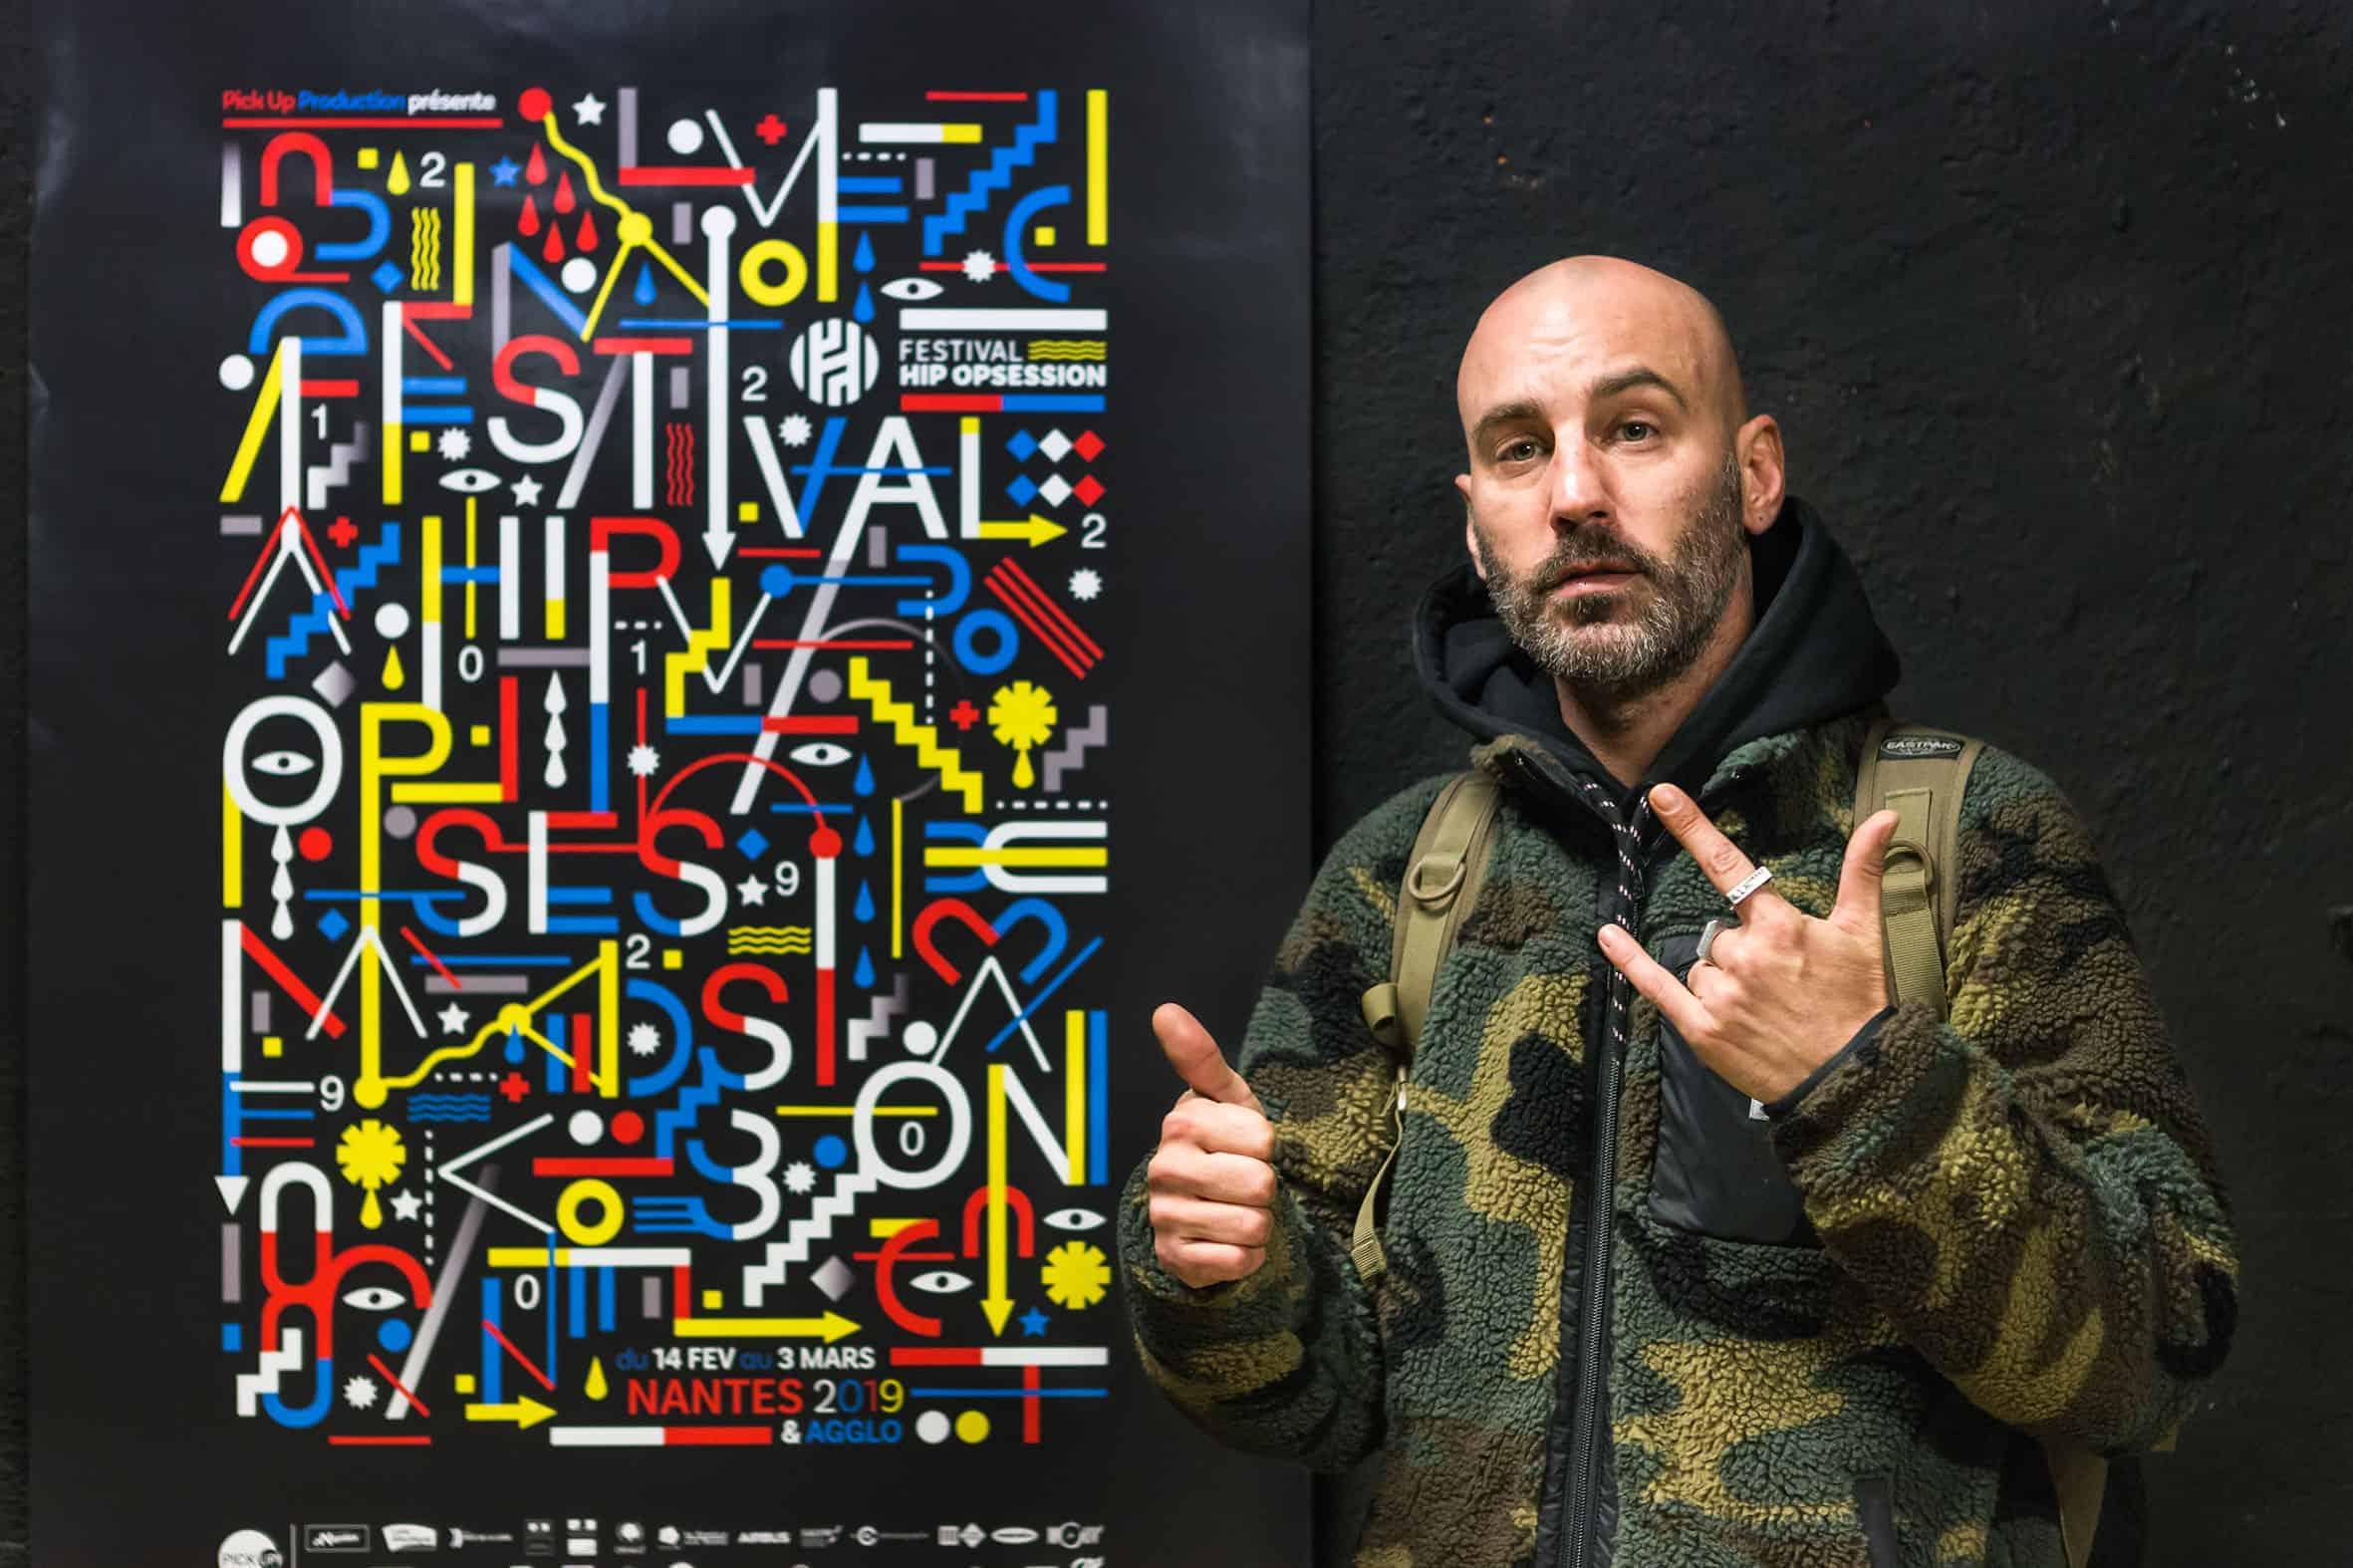 festival hip opsession nantes 2019 qg ©JeremyJehanin